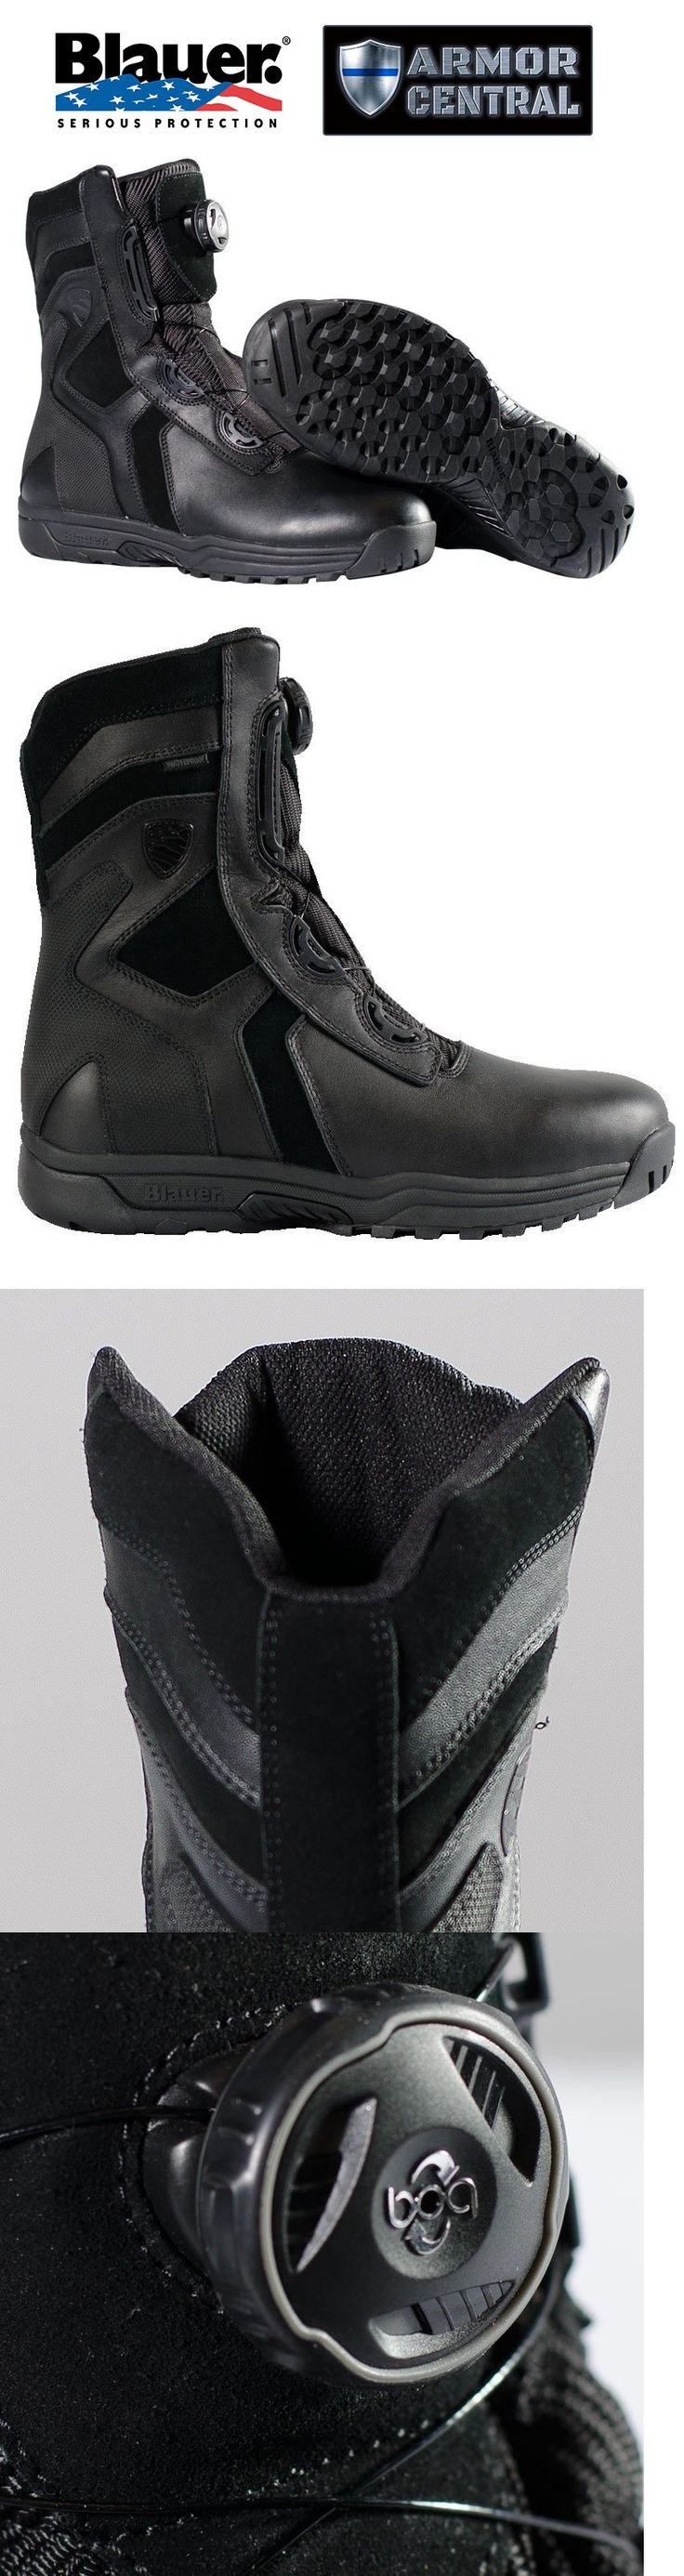 Tactical Footwear 177897: New Blauer 8 Black Blitz Waterproof Boot - Law Enforcement - Swat - Fw028wp -> BUY IT NOW ONLY: $174.95 on eBay!